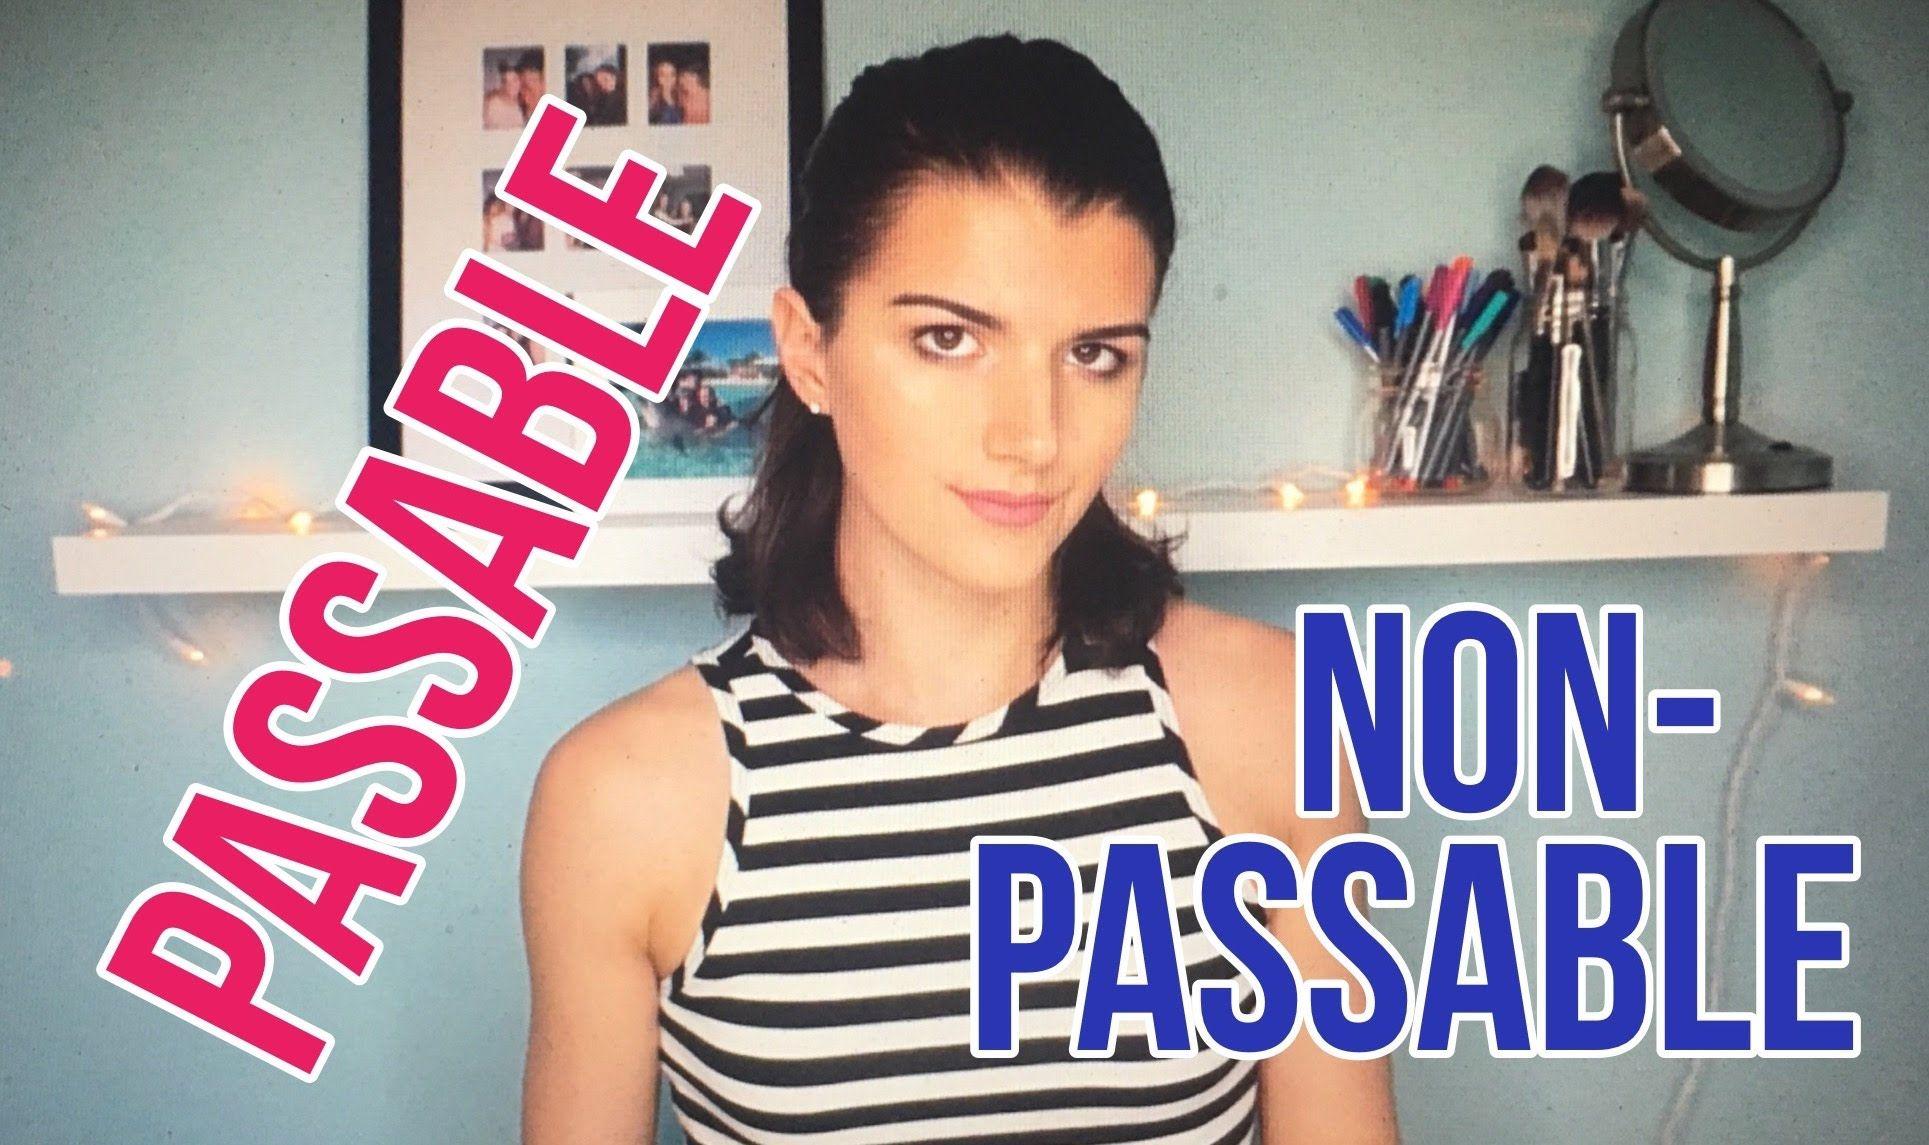 How To Be A Passable Transgender Women Trans Mtf Social Aspects Mythology